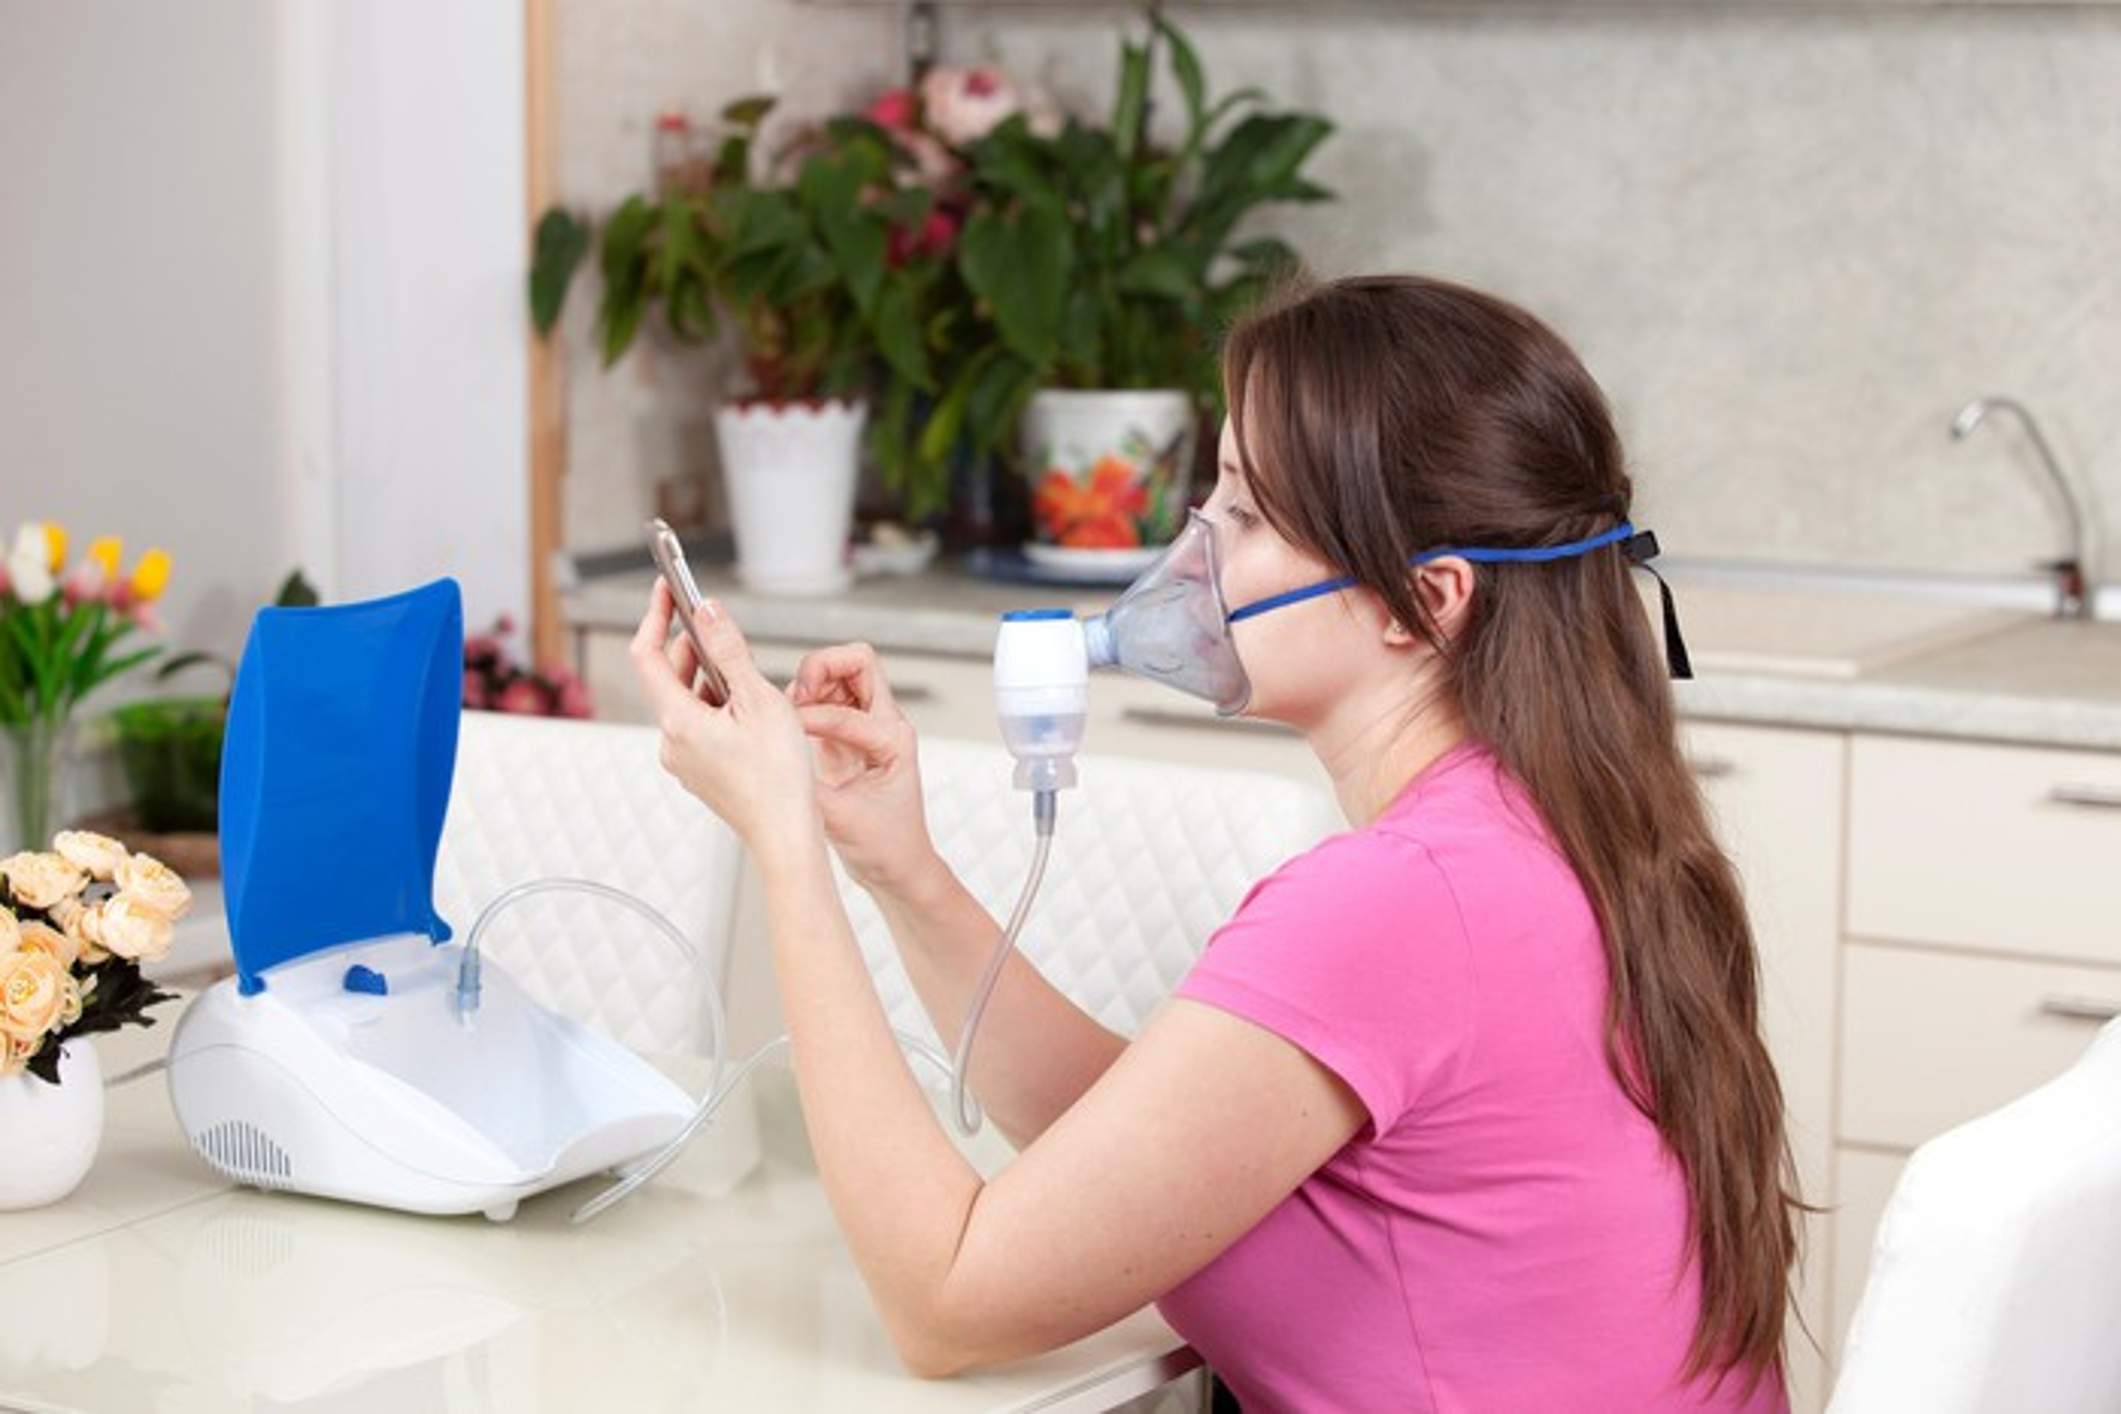 Woman using a nebulizer to inhale medicine.